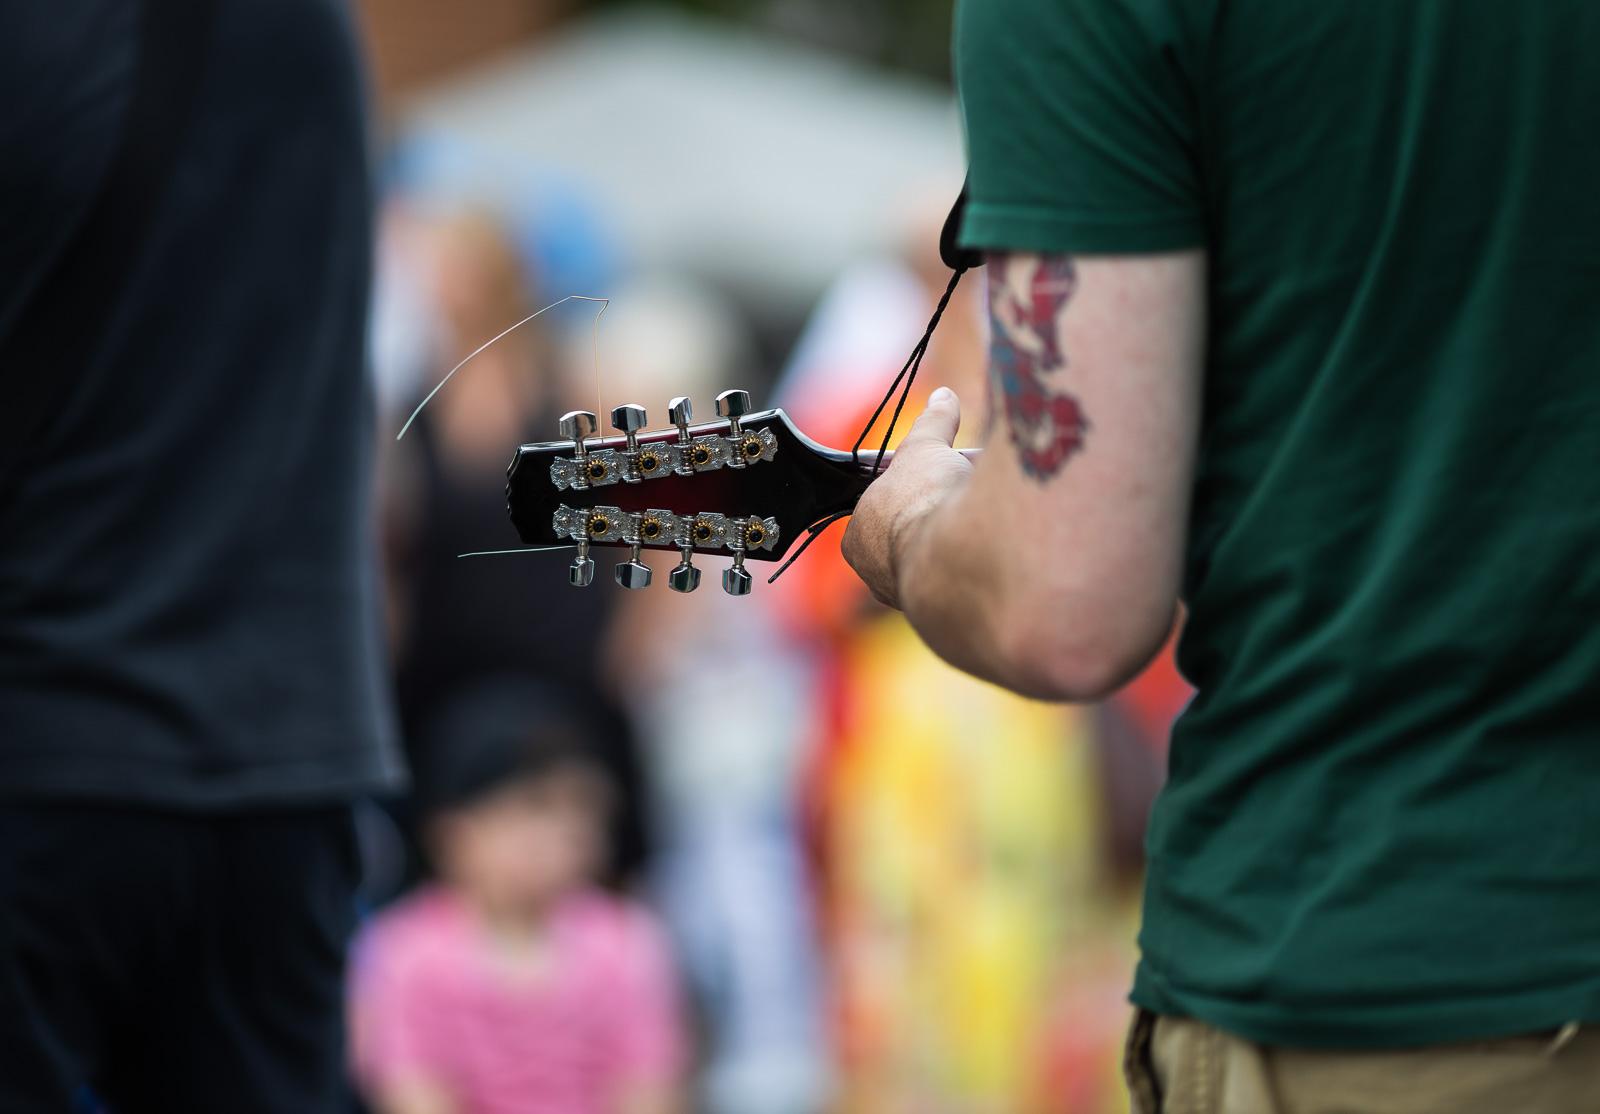 7th-annual-buskers-festival-blog-34.jpg